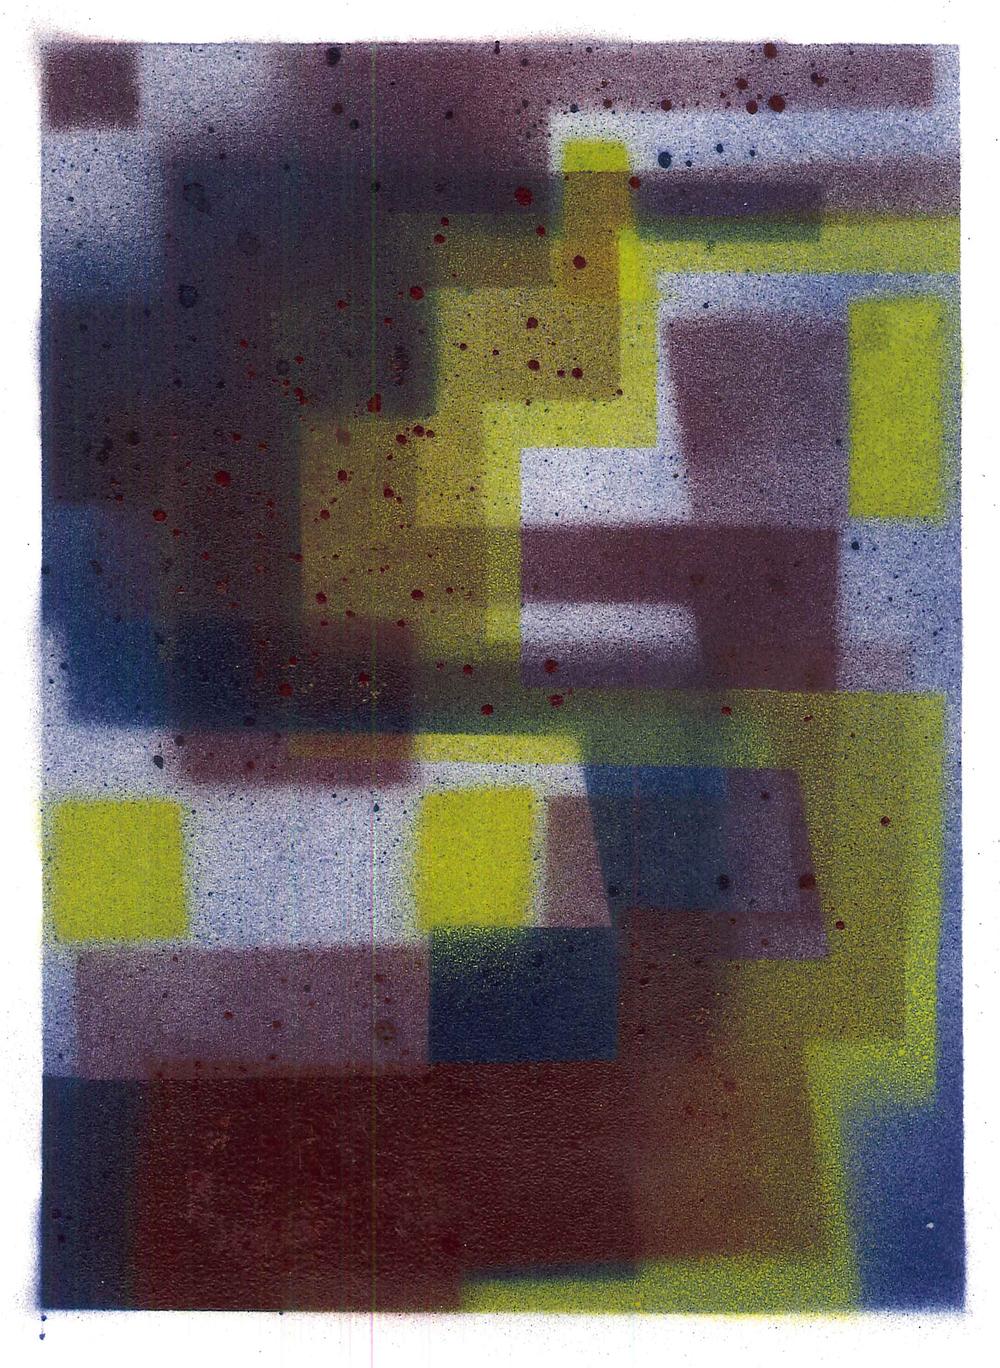 'S4', 2015, spray paint on cartridge paper, 15 x 21 cm